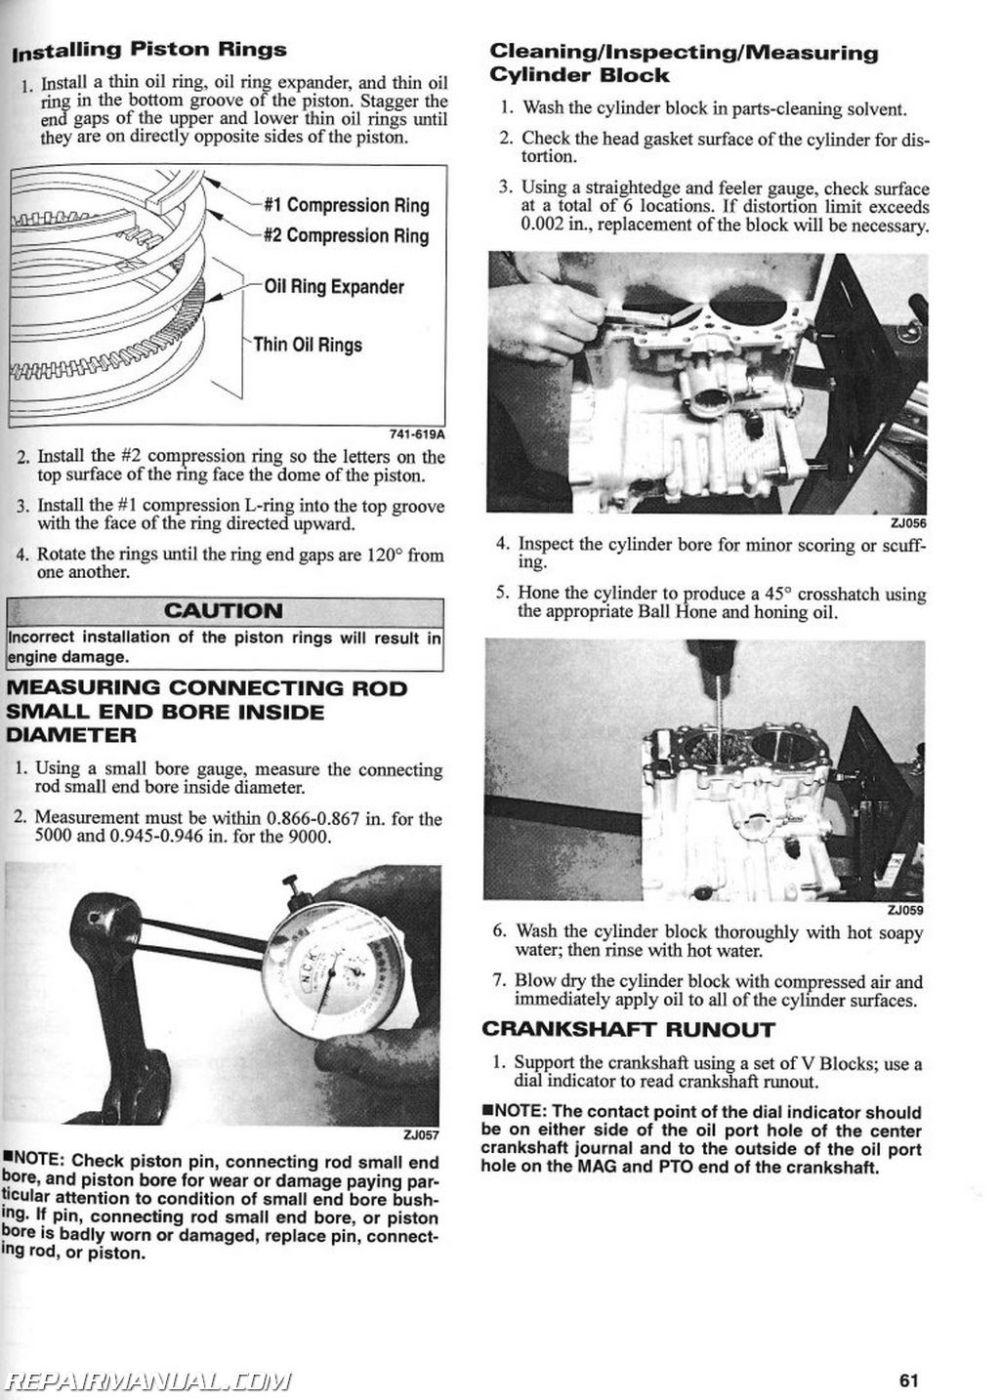 medium resolution of mercruiser repair manuals outboard service manuals